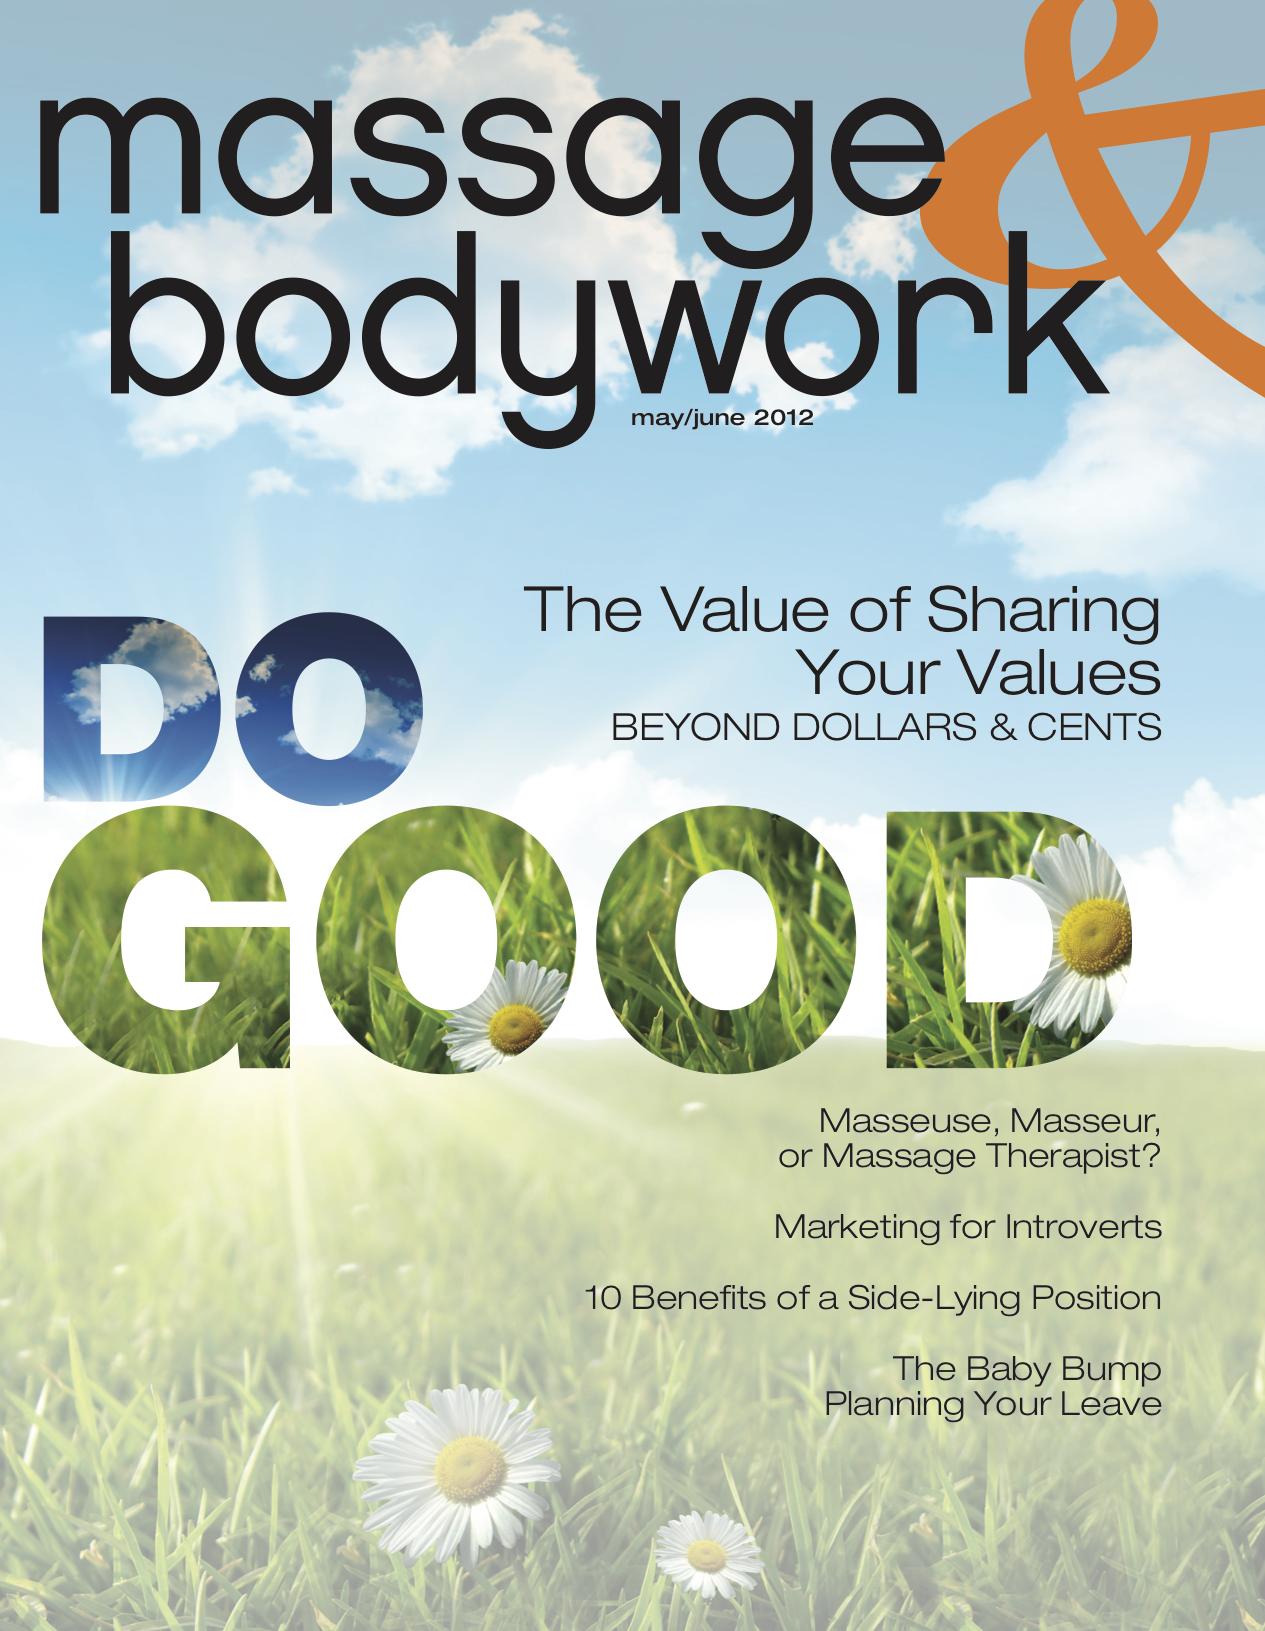 Massage & Bodywork - May / June 2012